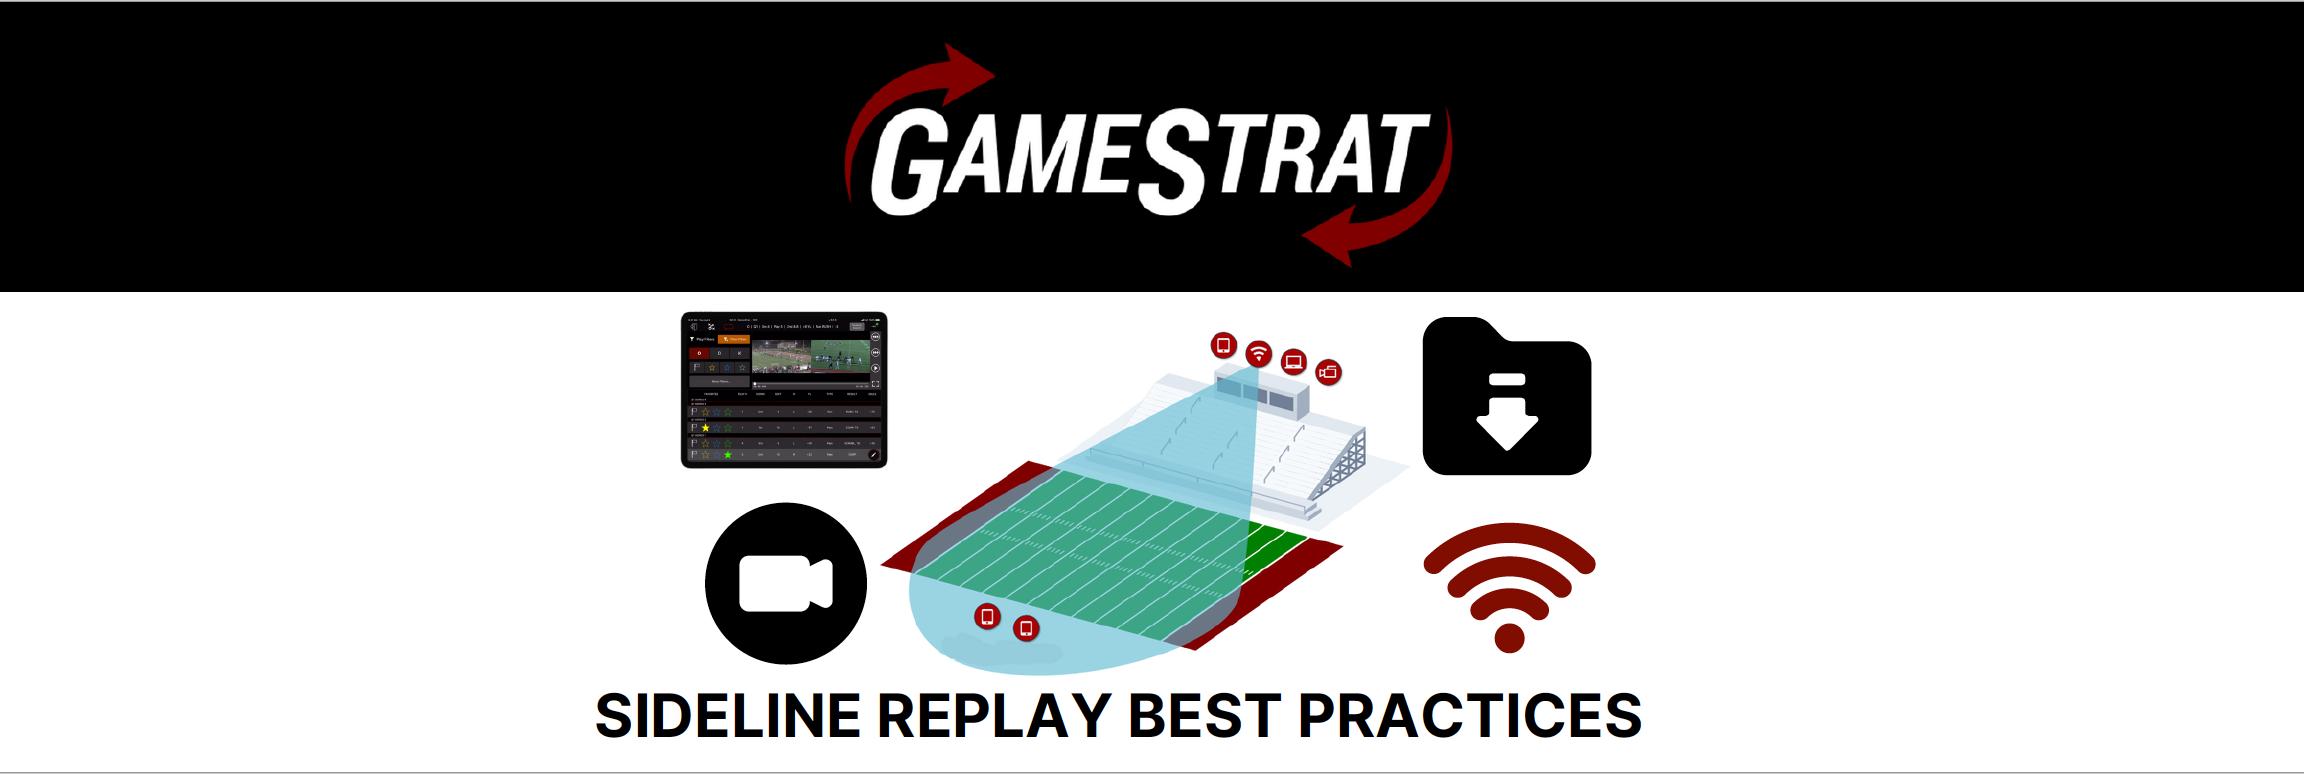 Sideline Replay Best Practices